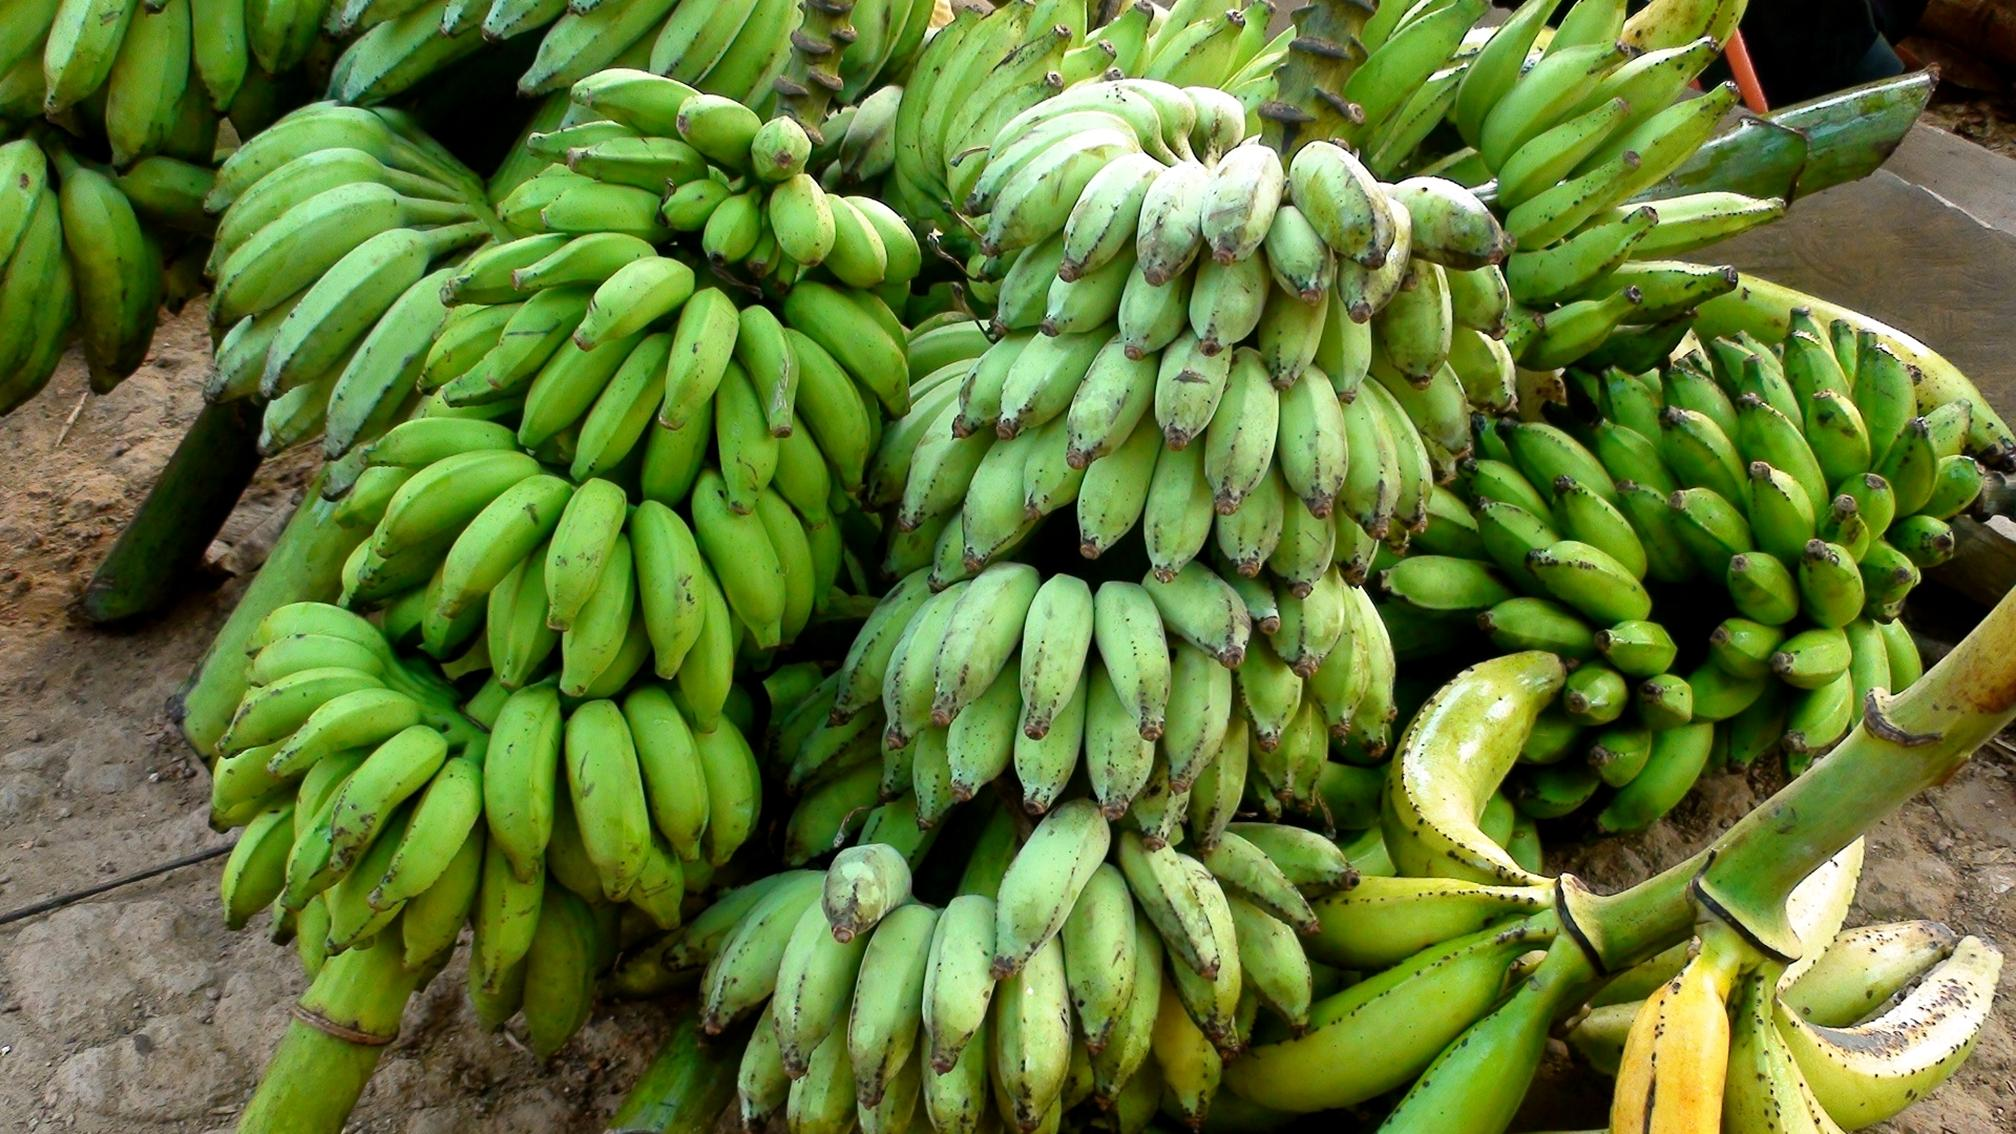 image libre banane fruit nourriture immature r gime v g tal de potassium organique. Black Bedroom Furniture Sets. Home Design Ideas